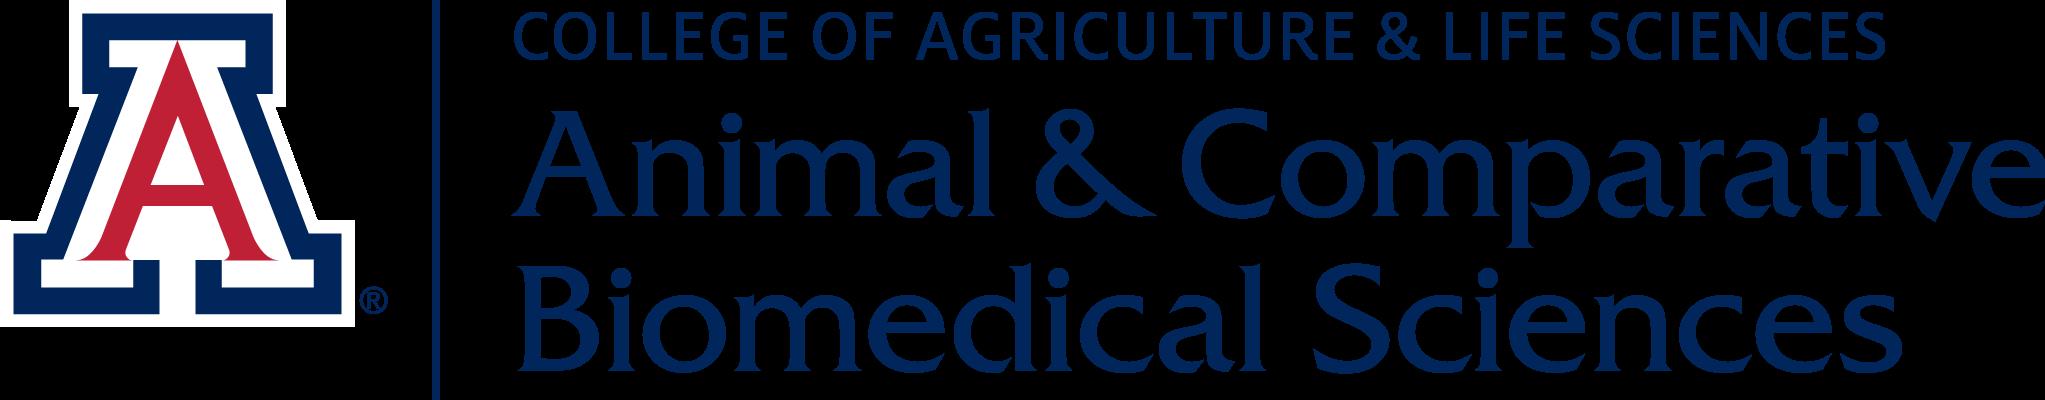 Animal & Comparative Biomedical Sciences logo